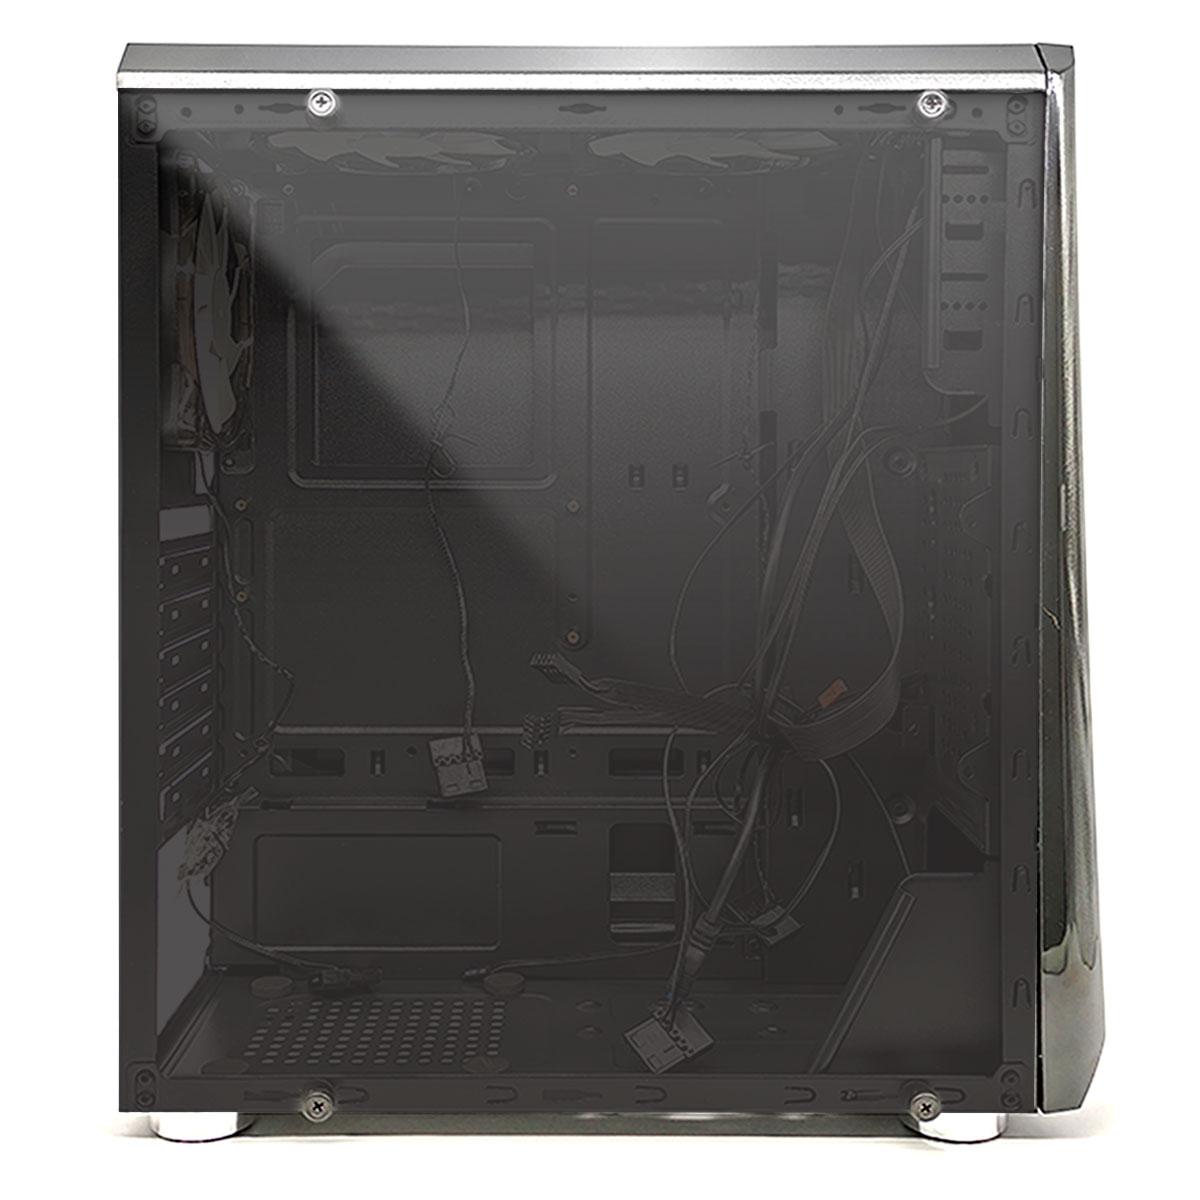 Gabinete Gamer OEX Shelter GH200, Preto, LED RGB, 3 Coolers